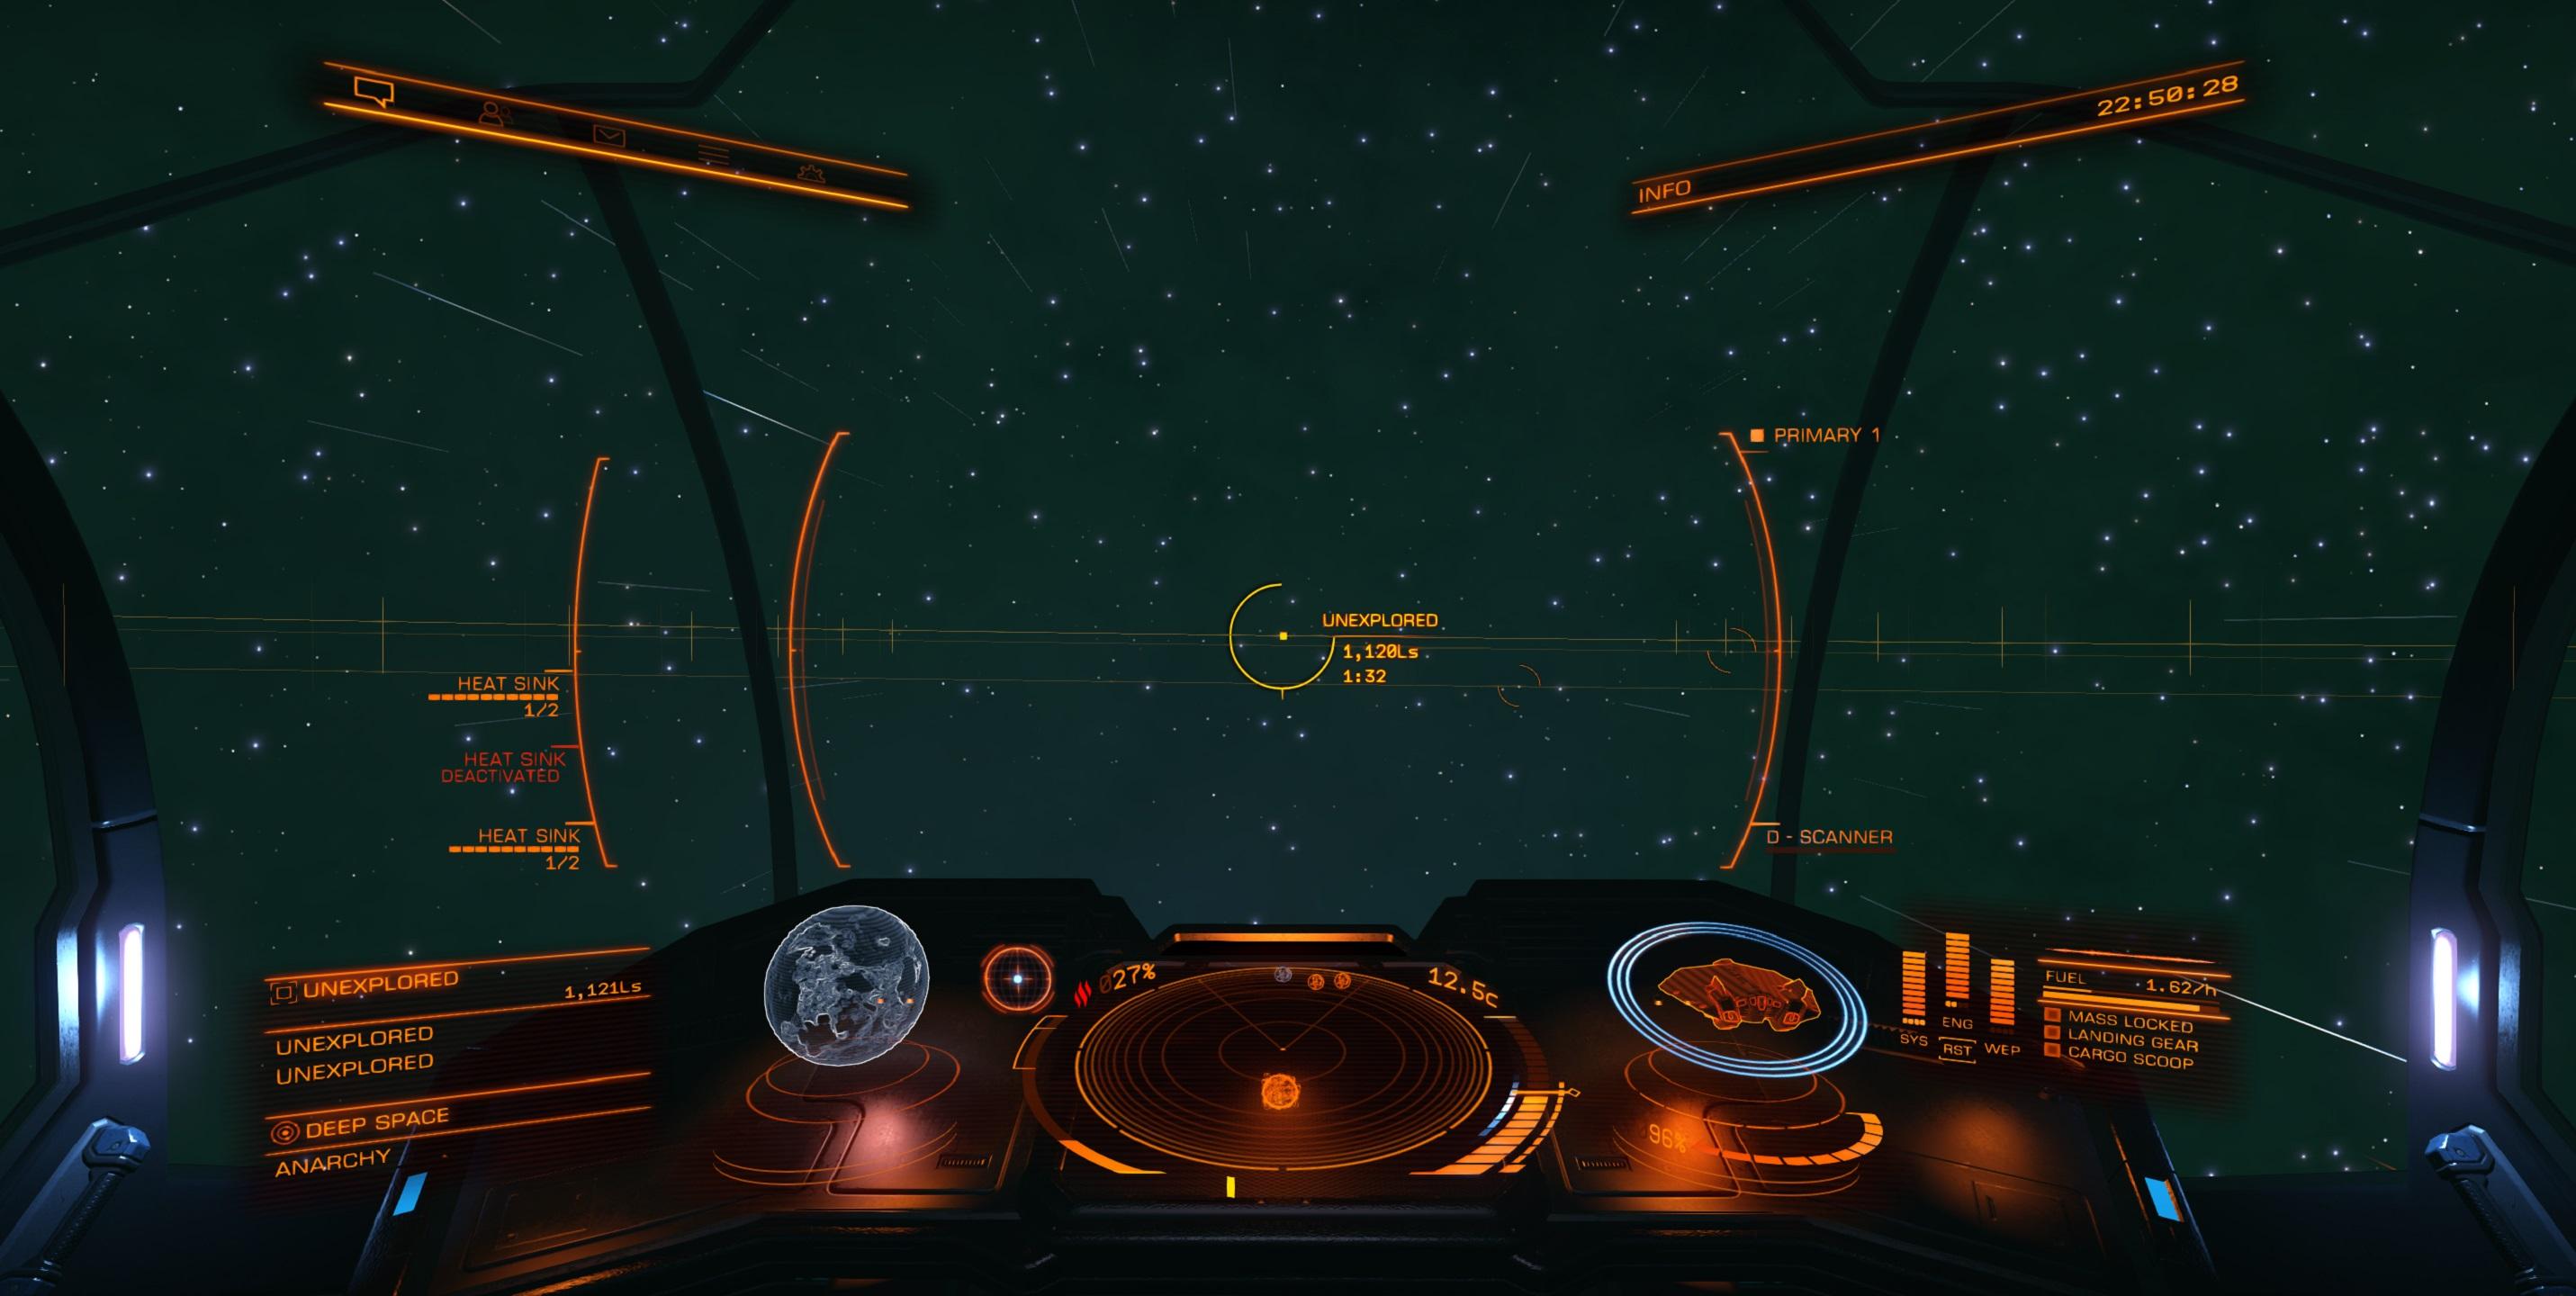 Smaragd Cockpit